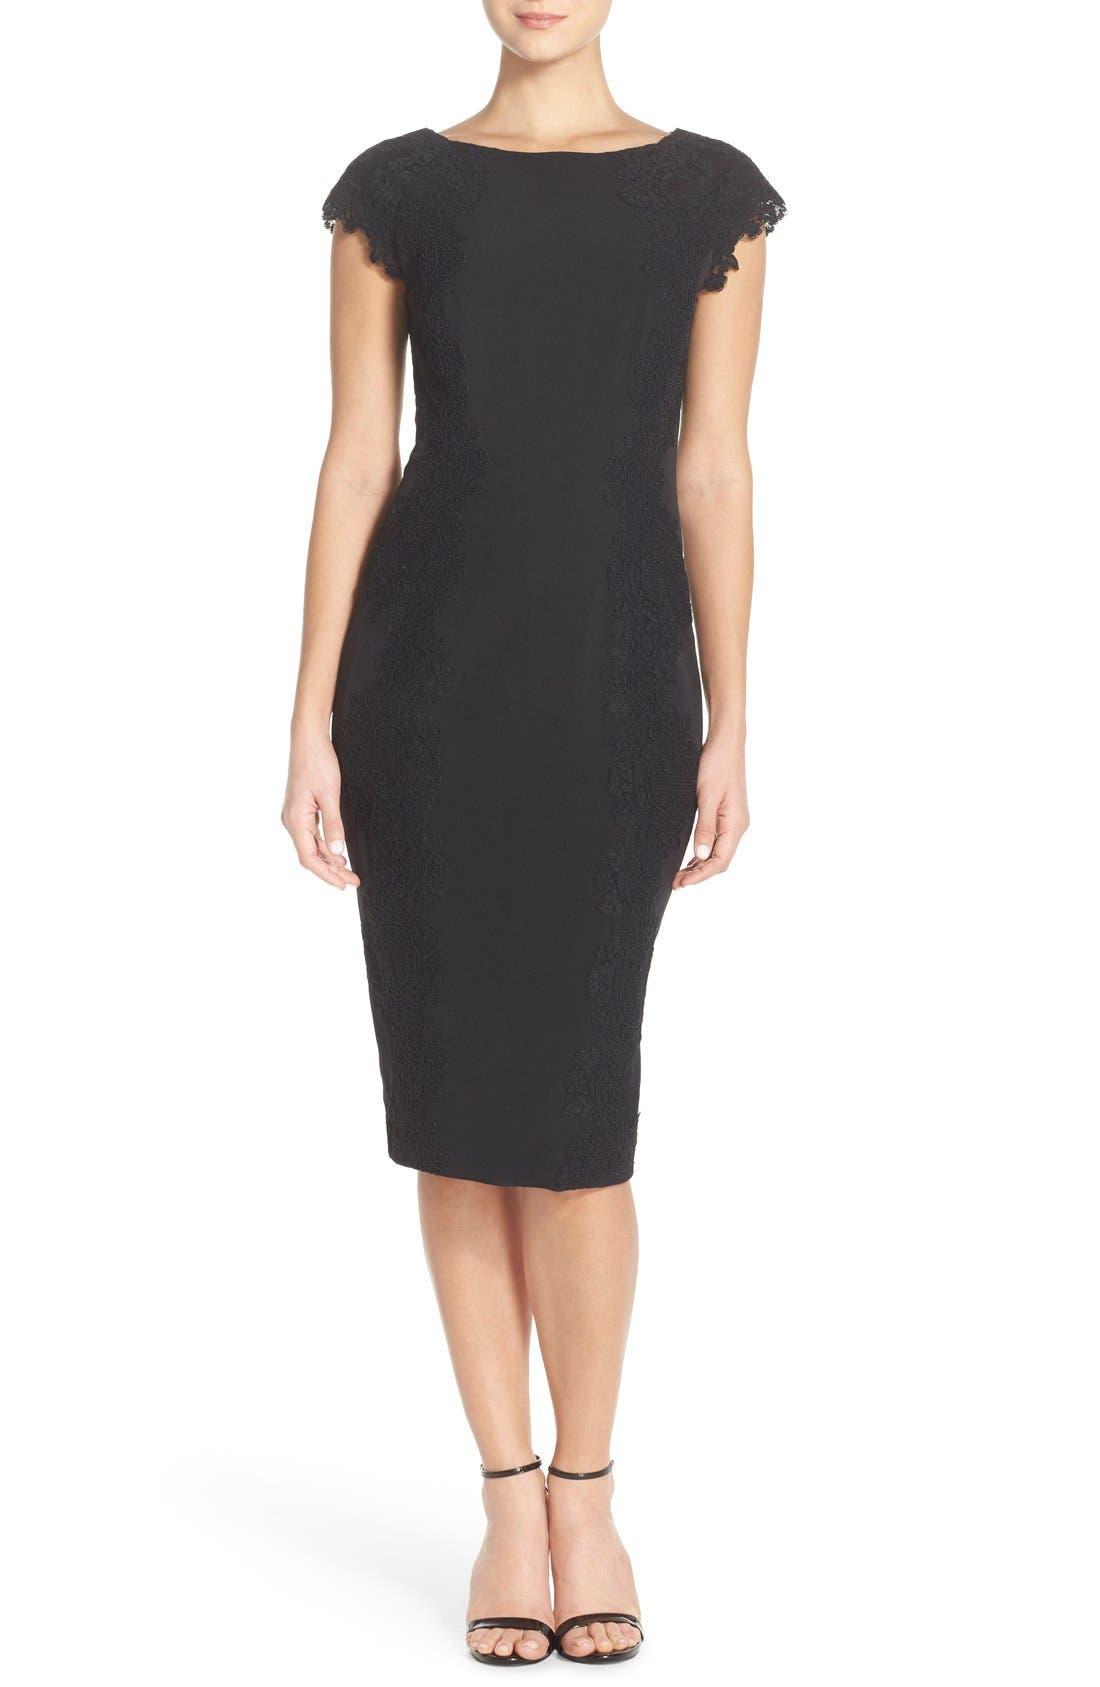 Black sheath cocktail dresses size 8